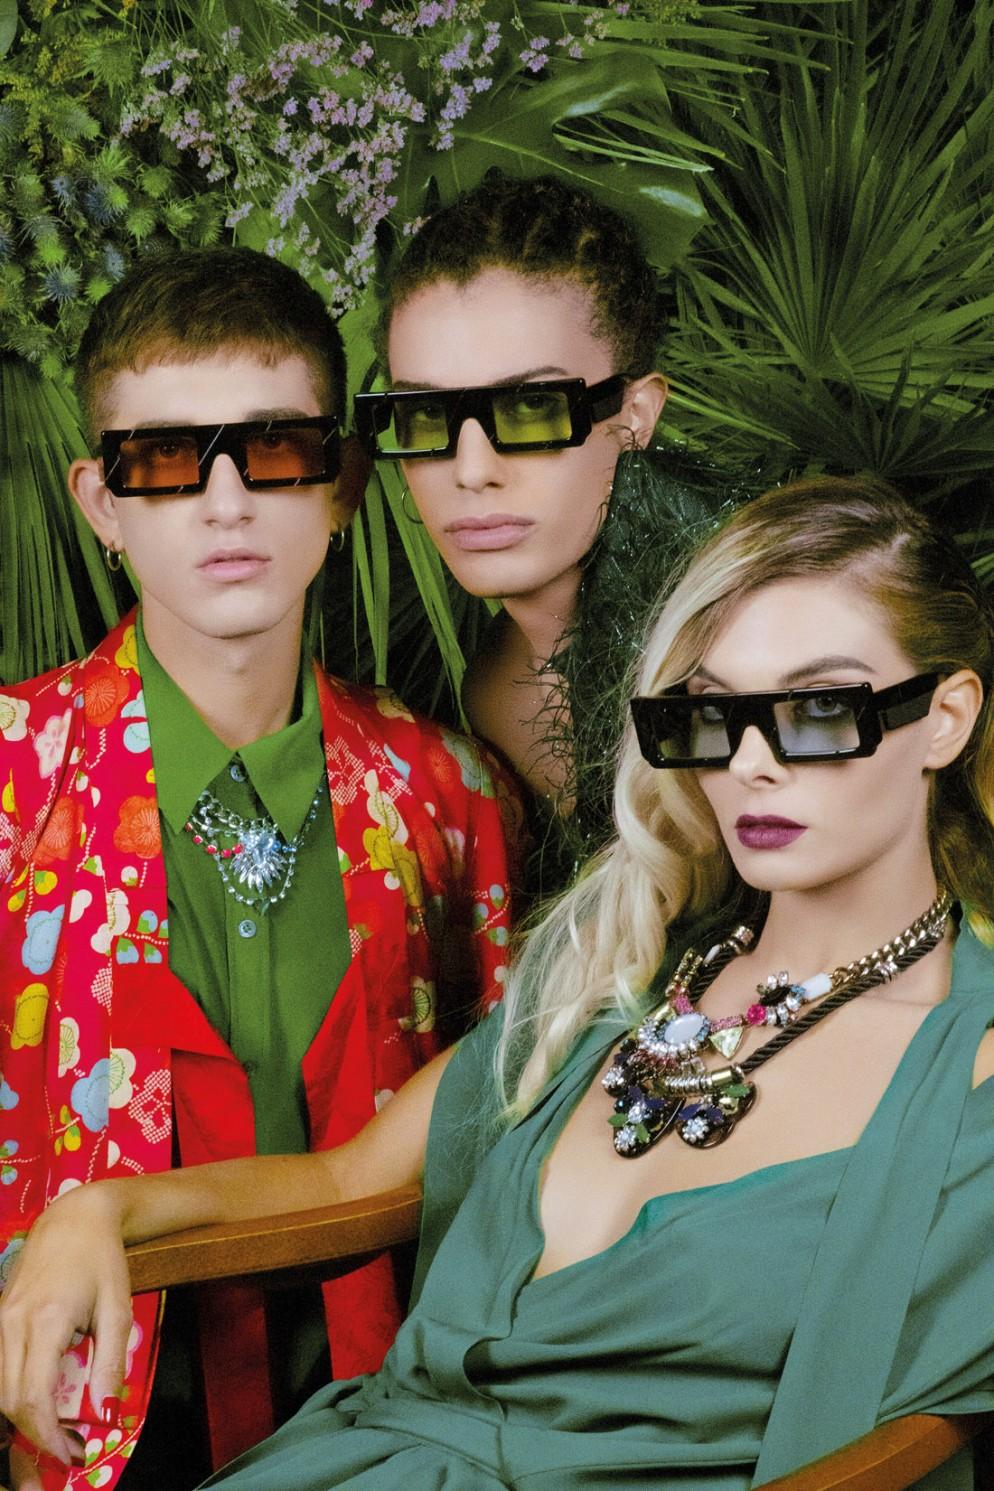 occhiali-bayria-eyewear-pezzi-unici-da-collezione